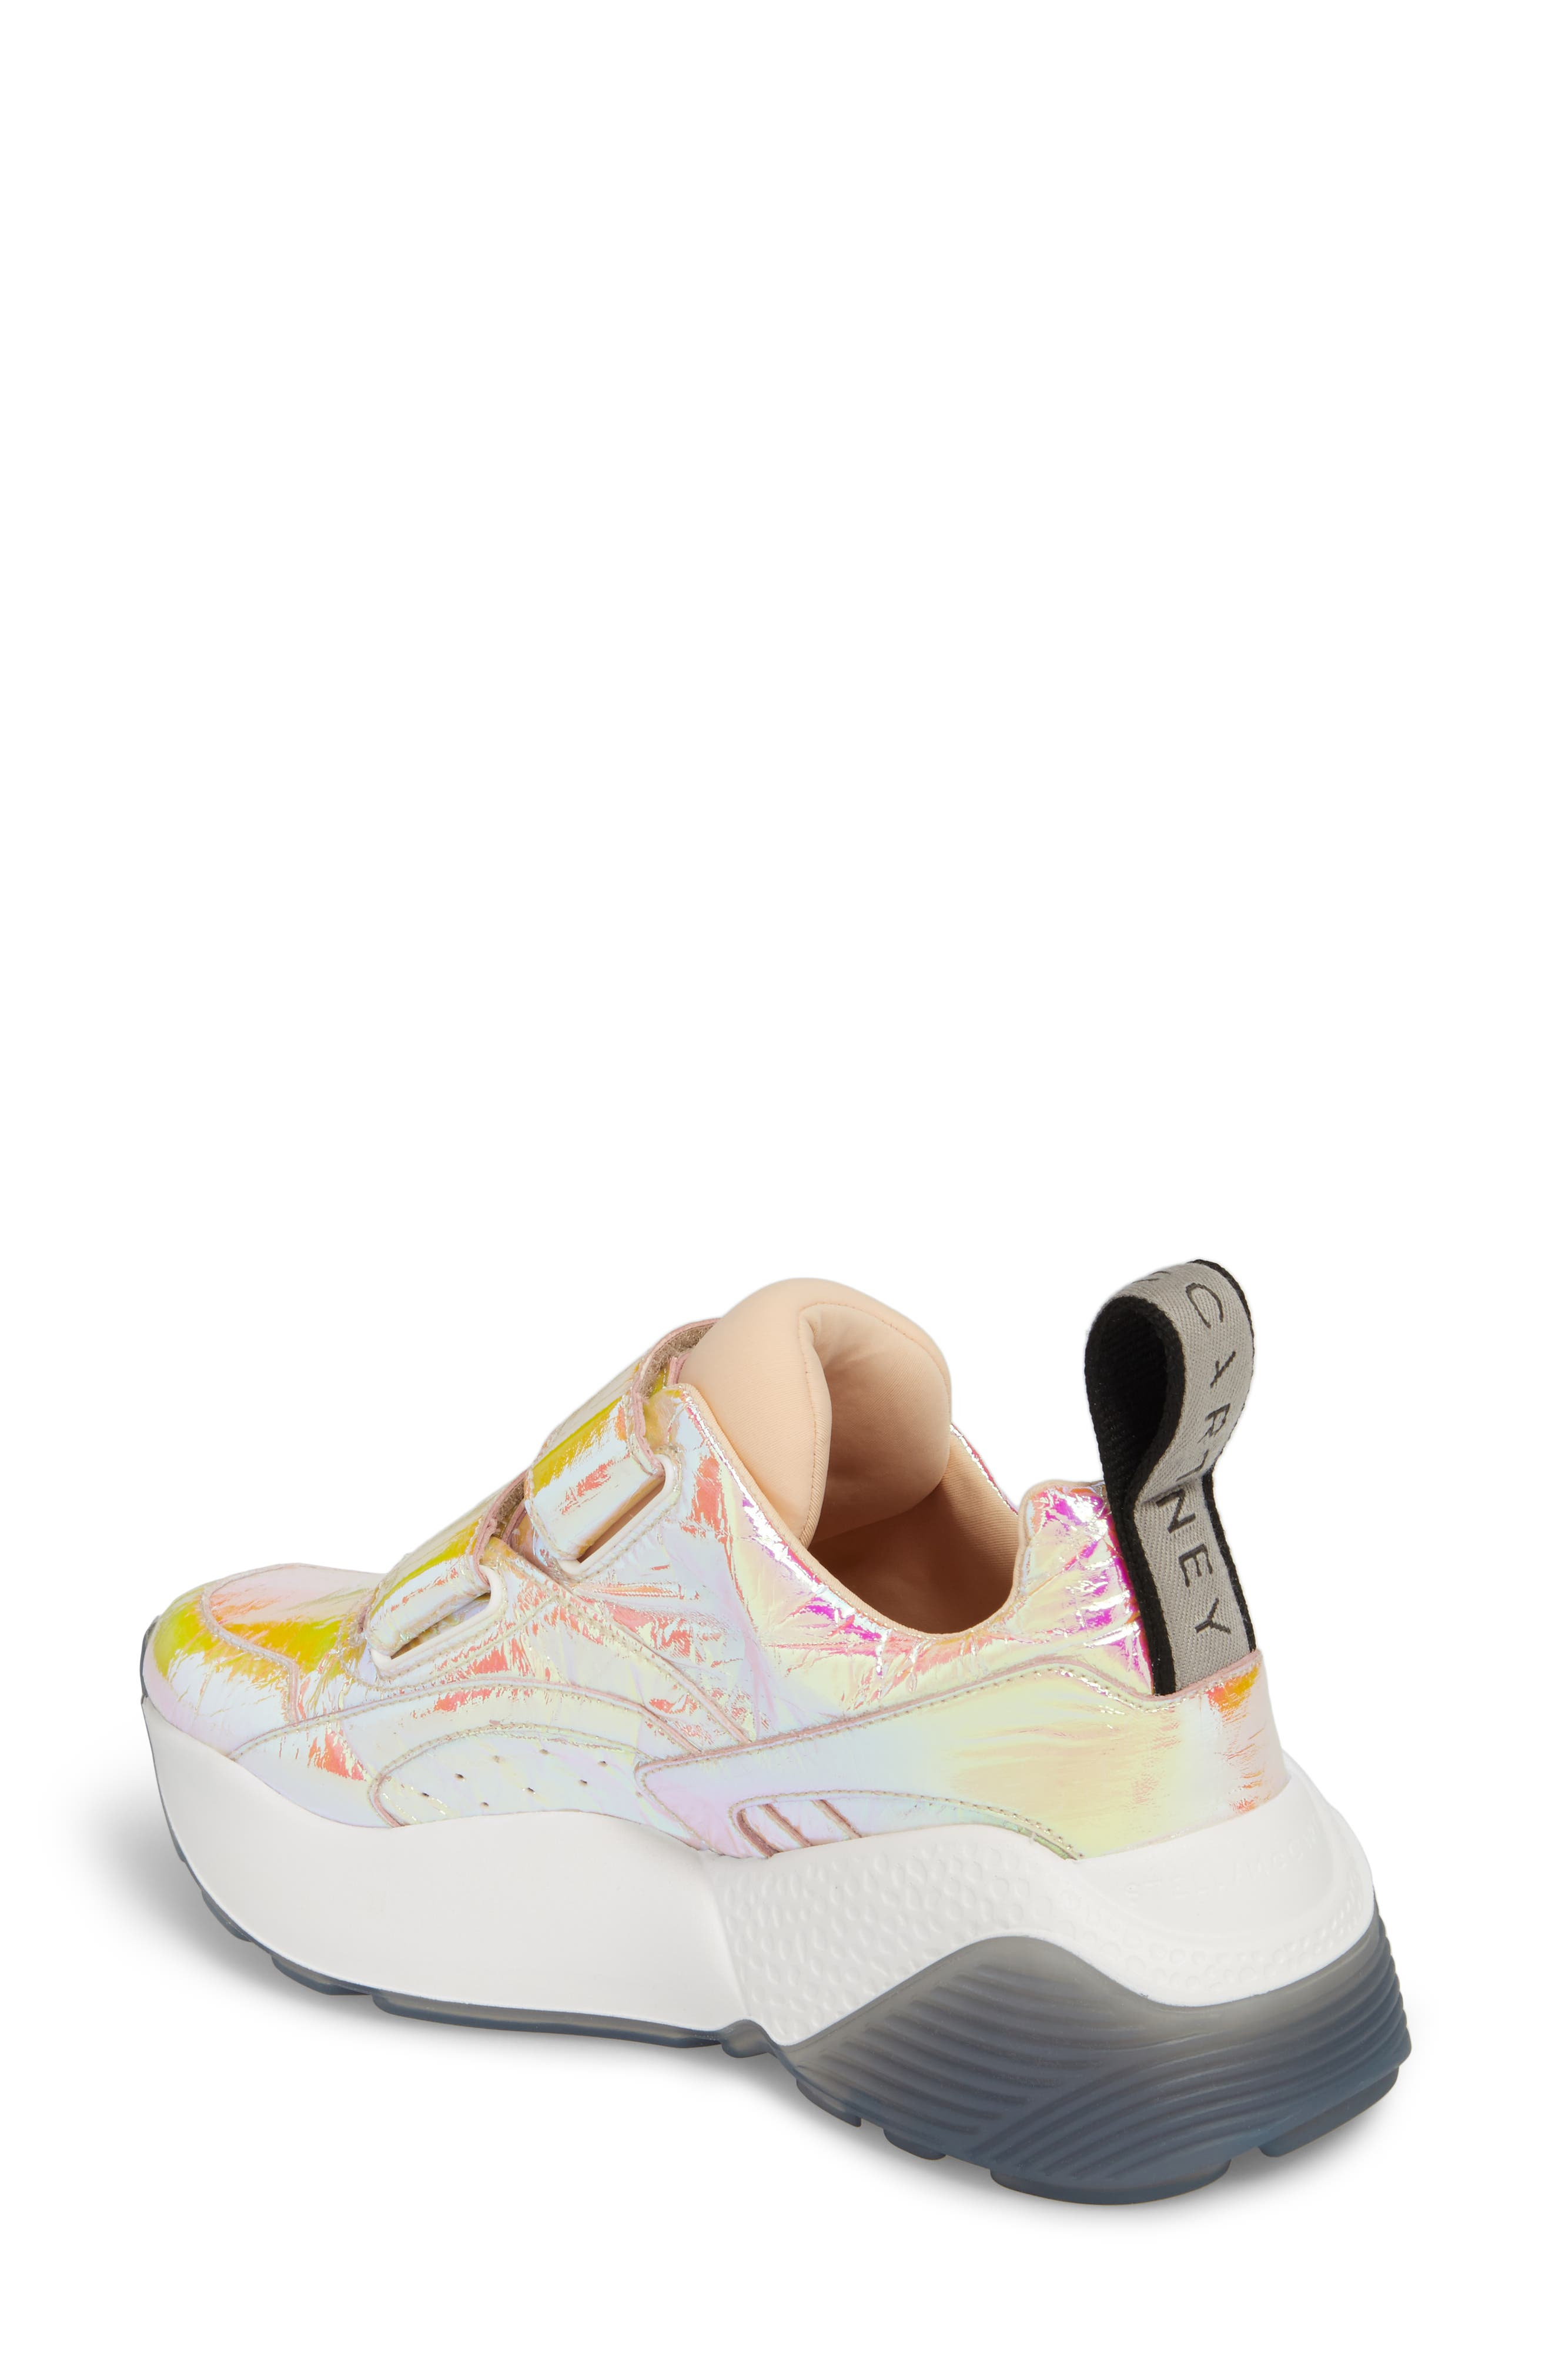 Prisma Sneaker,                             Alternate thumbnail 2, color,                             Prisma